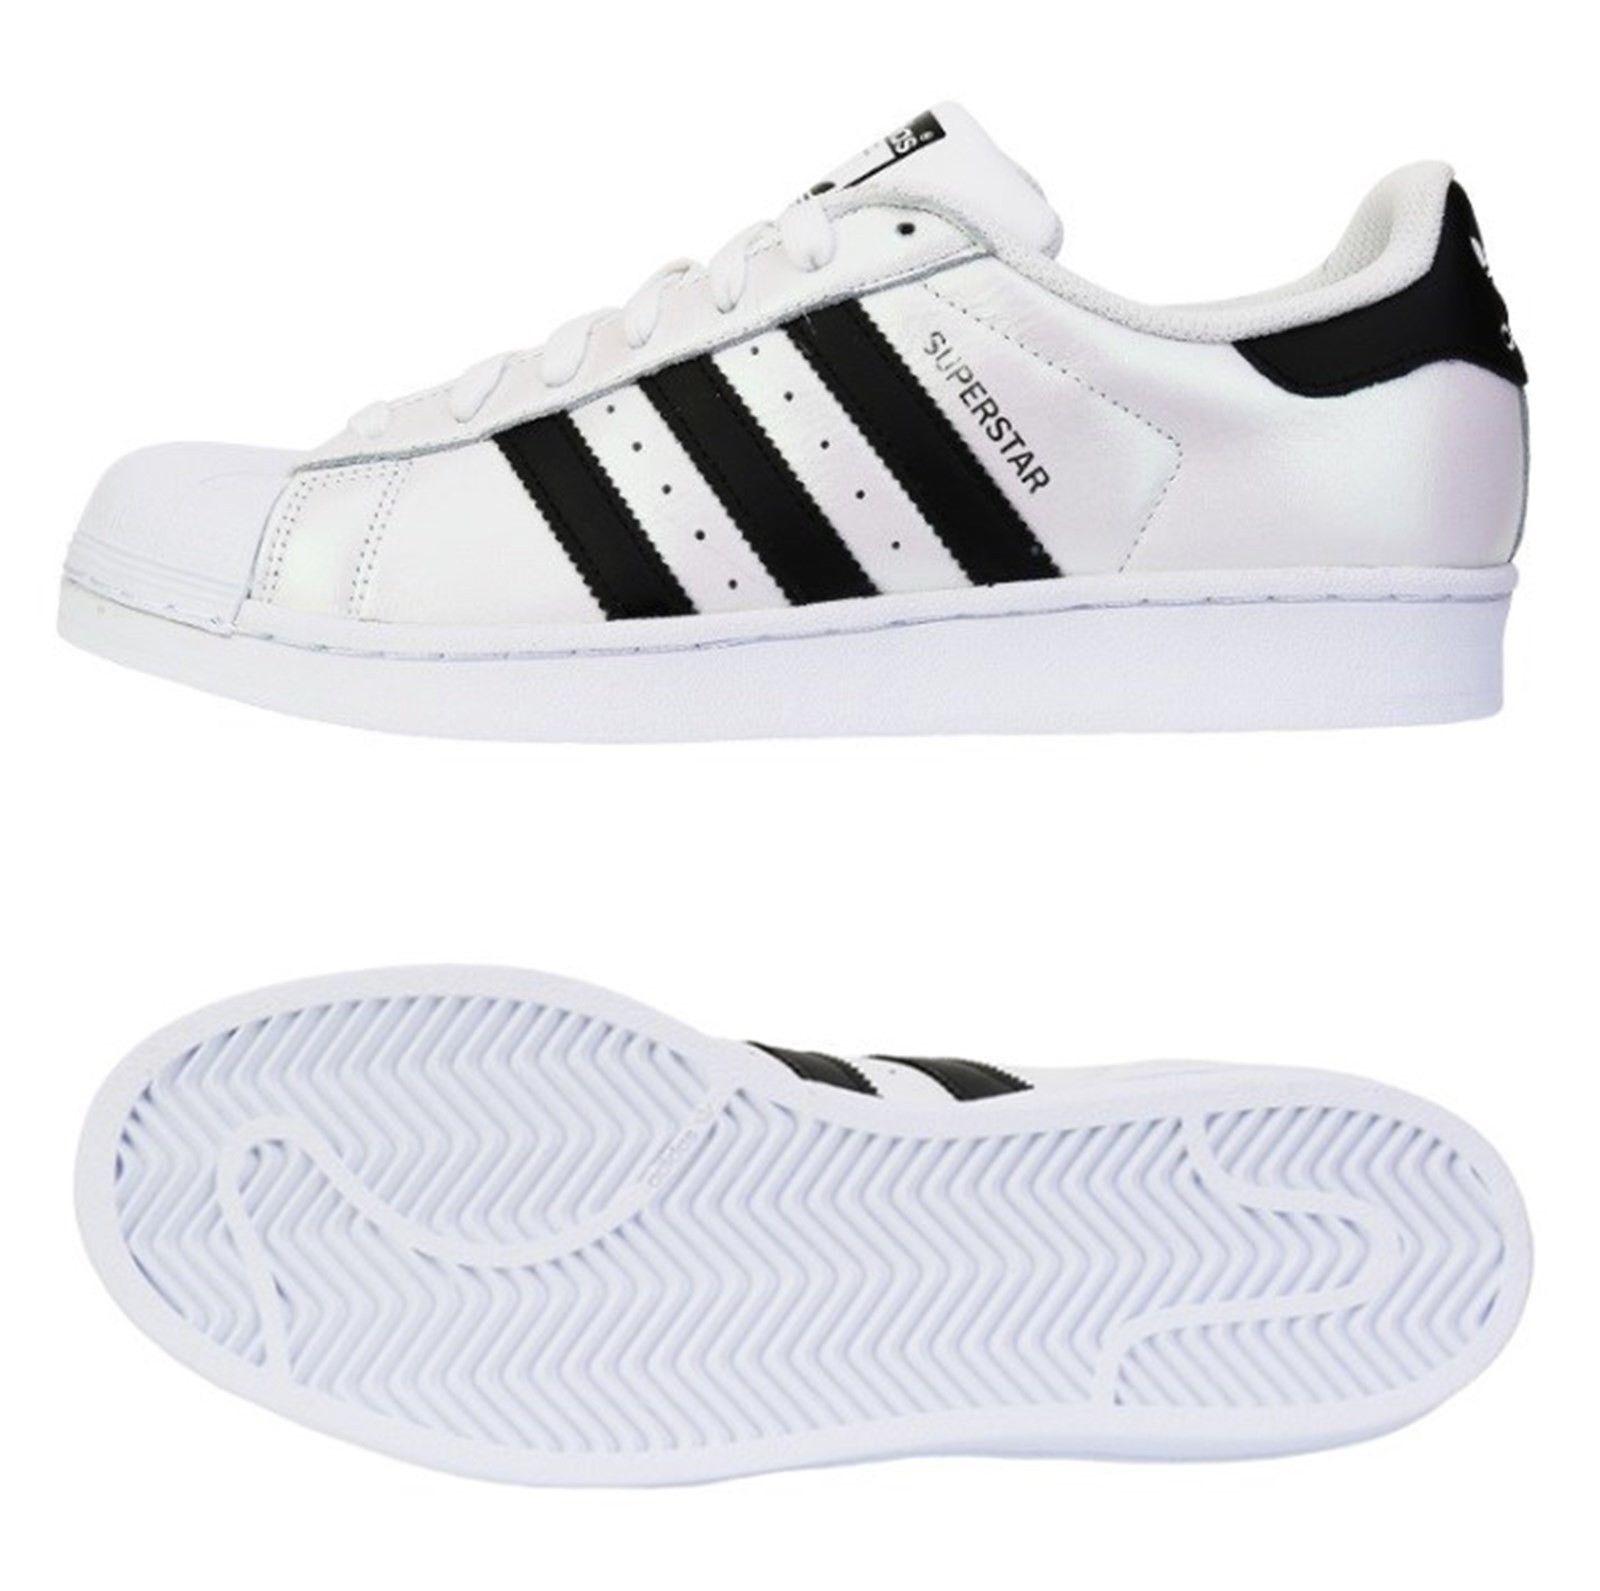 Adidas Uomo Shoes Original Superstar 2016 Running  White Shoe GYM S75873